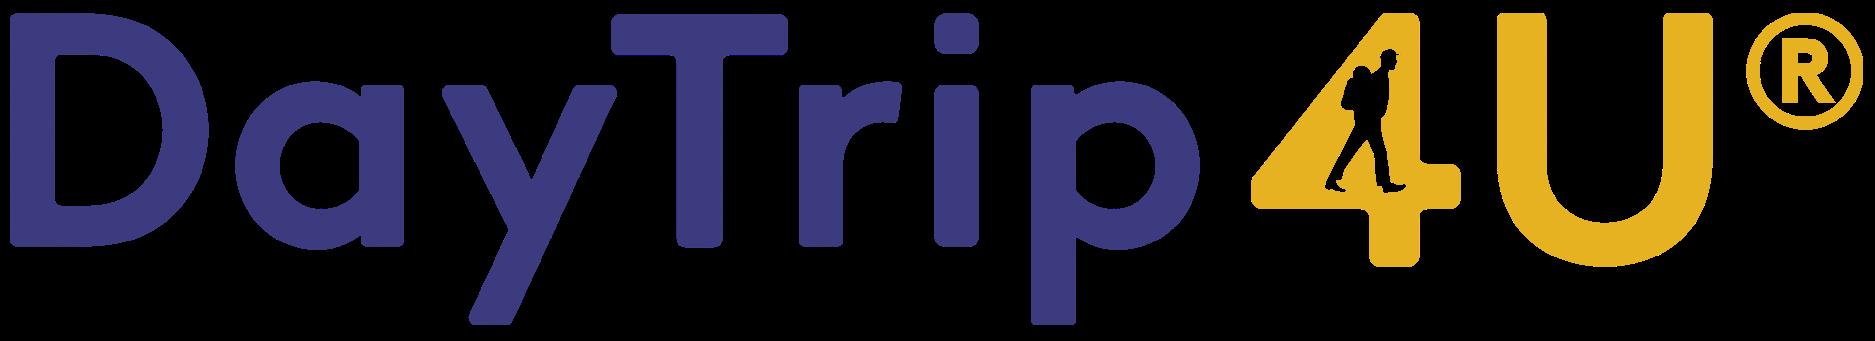 New logo cut